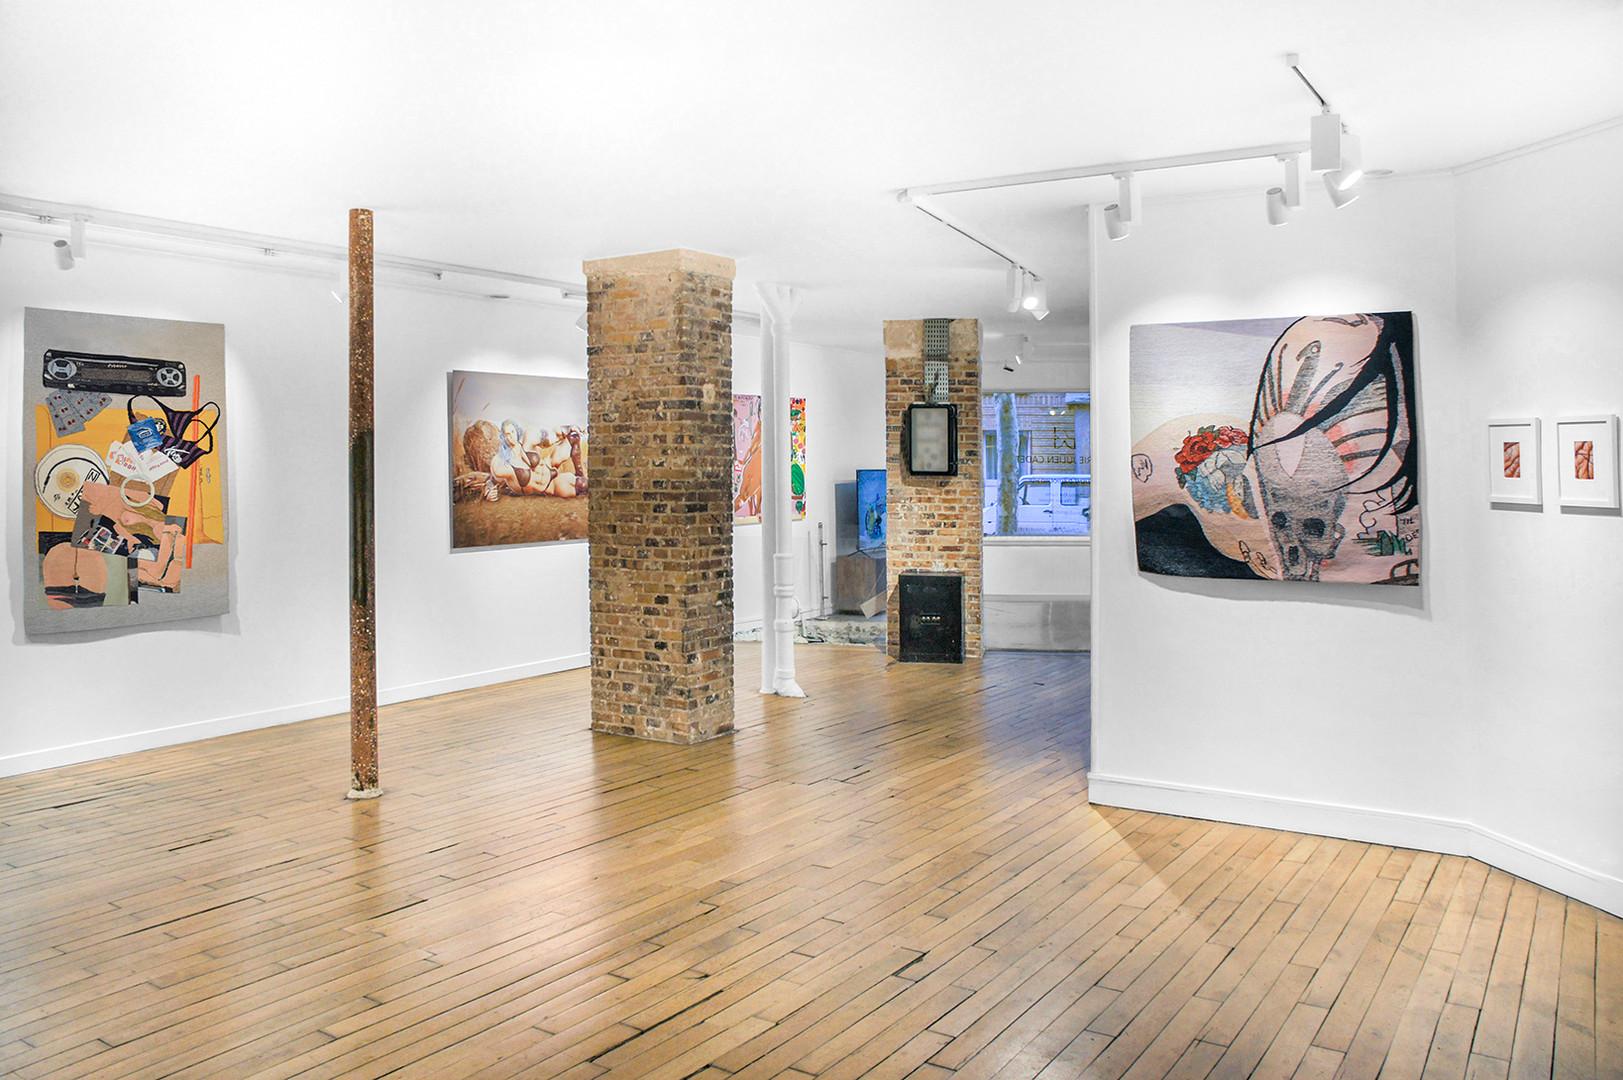 Galerie Julien Cadet Erin M. Riley, Christian Rex van Minnen, Theo Triantafyllidis Réalisme d'aujourd'hui